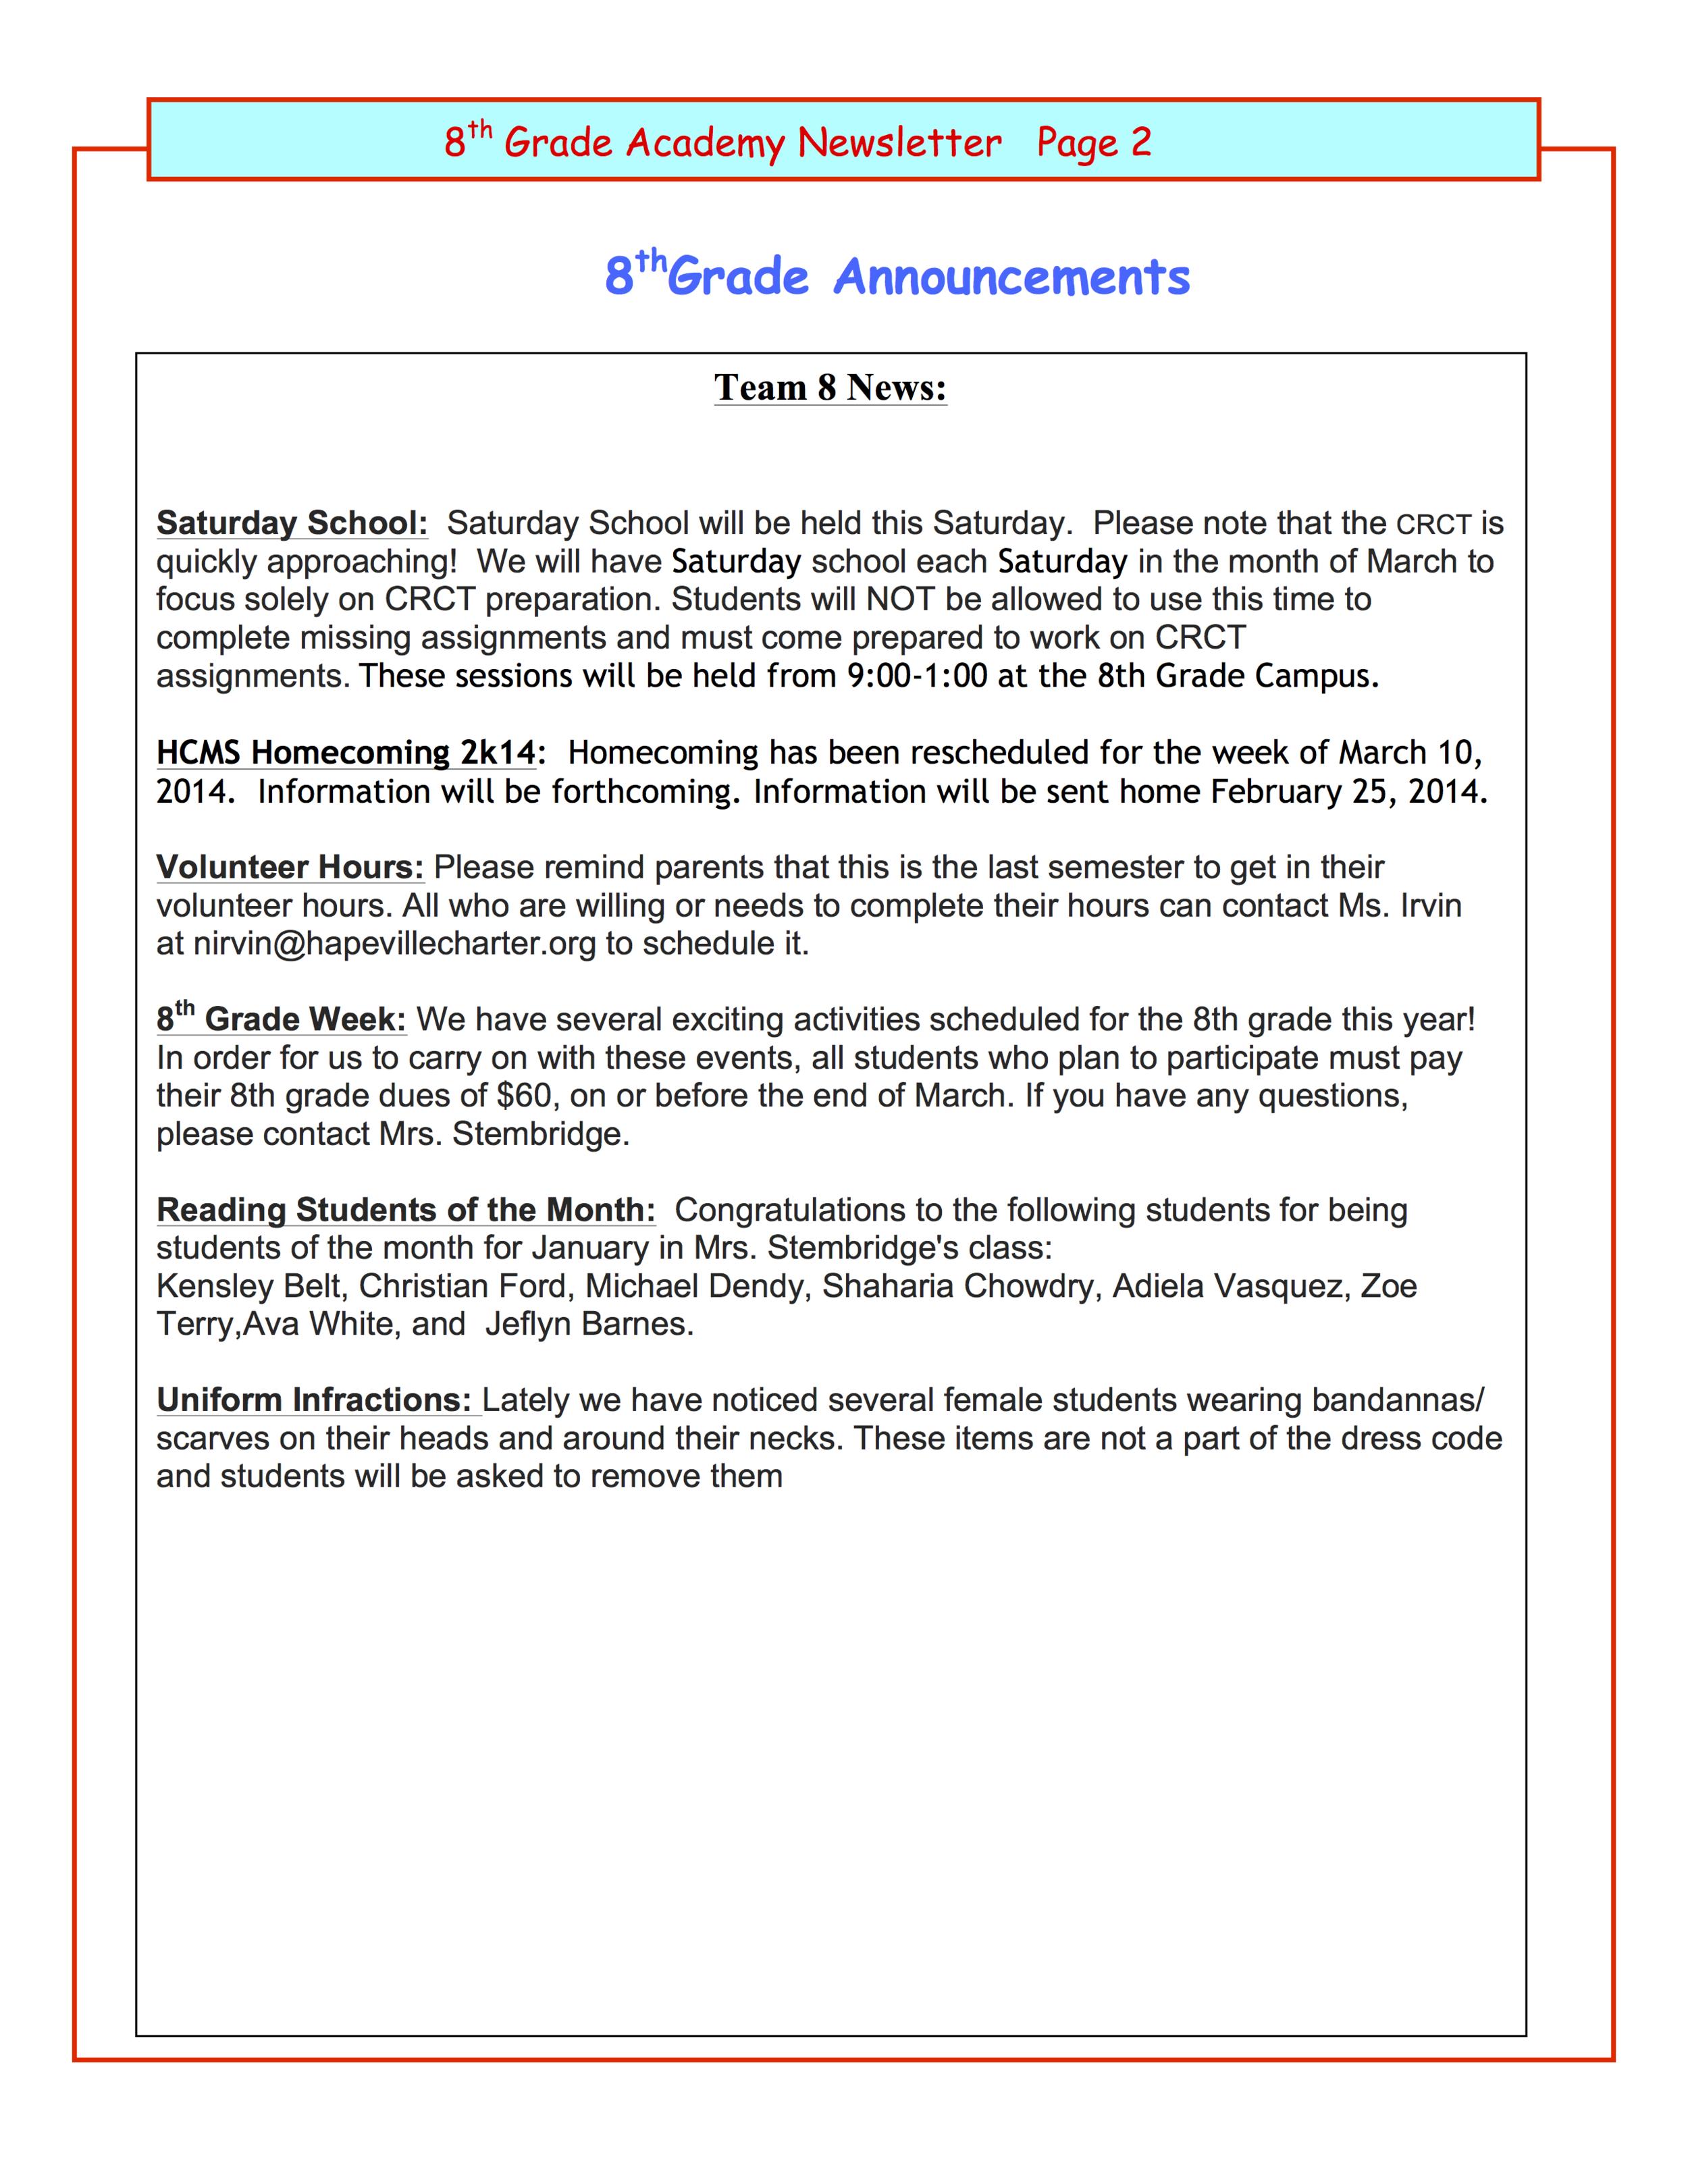 8th grade February 25 2014B.png